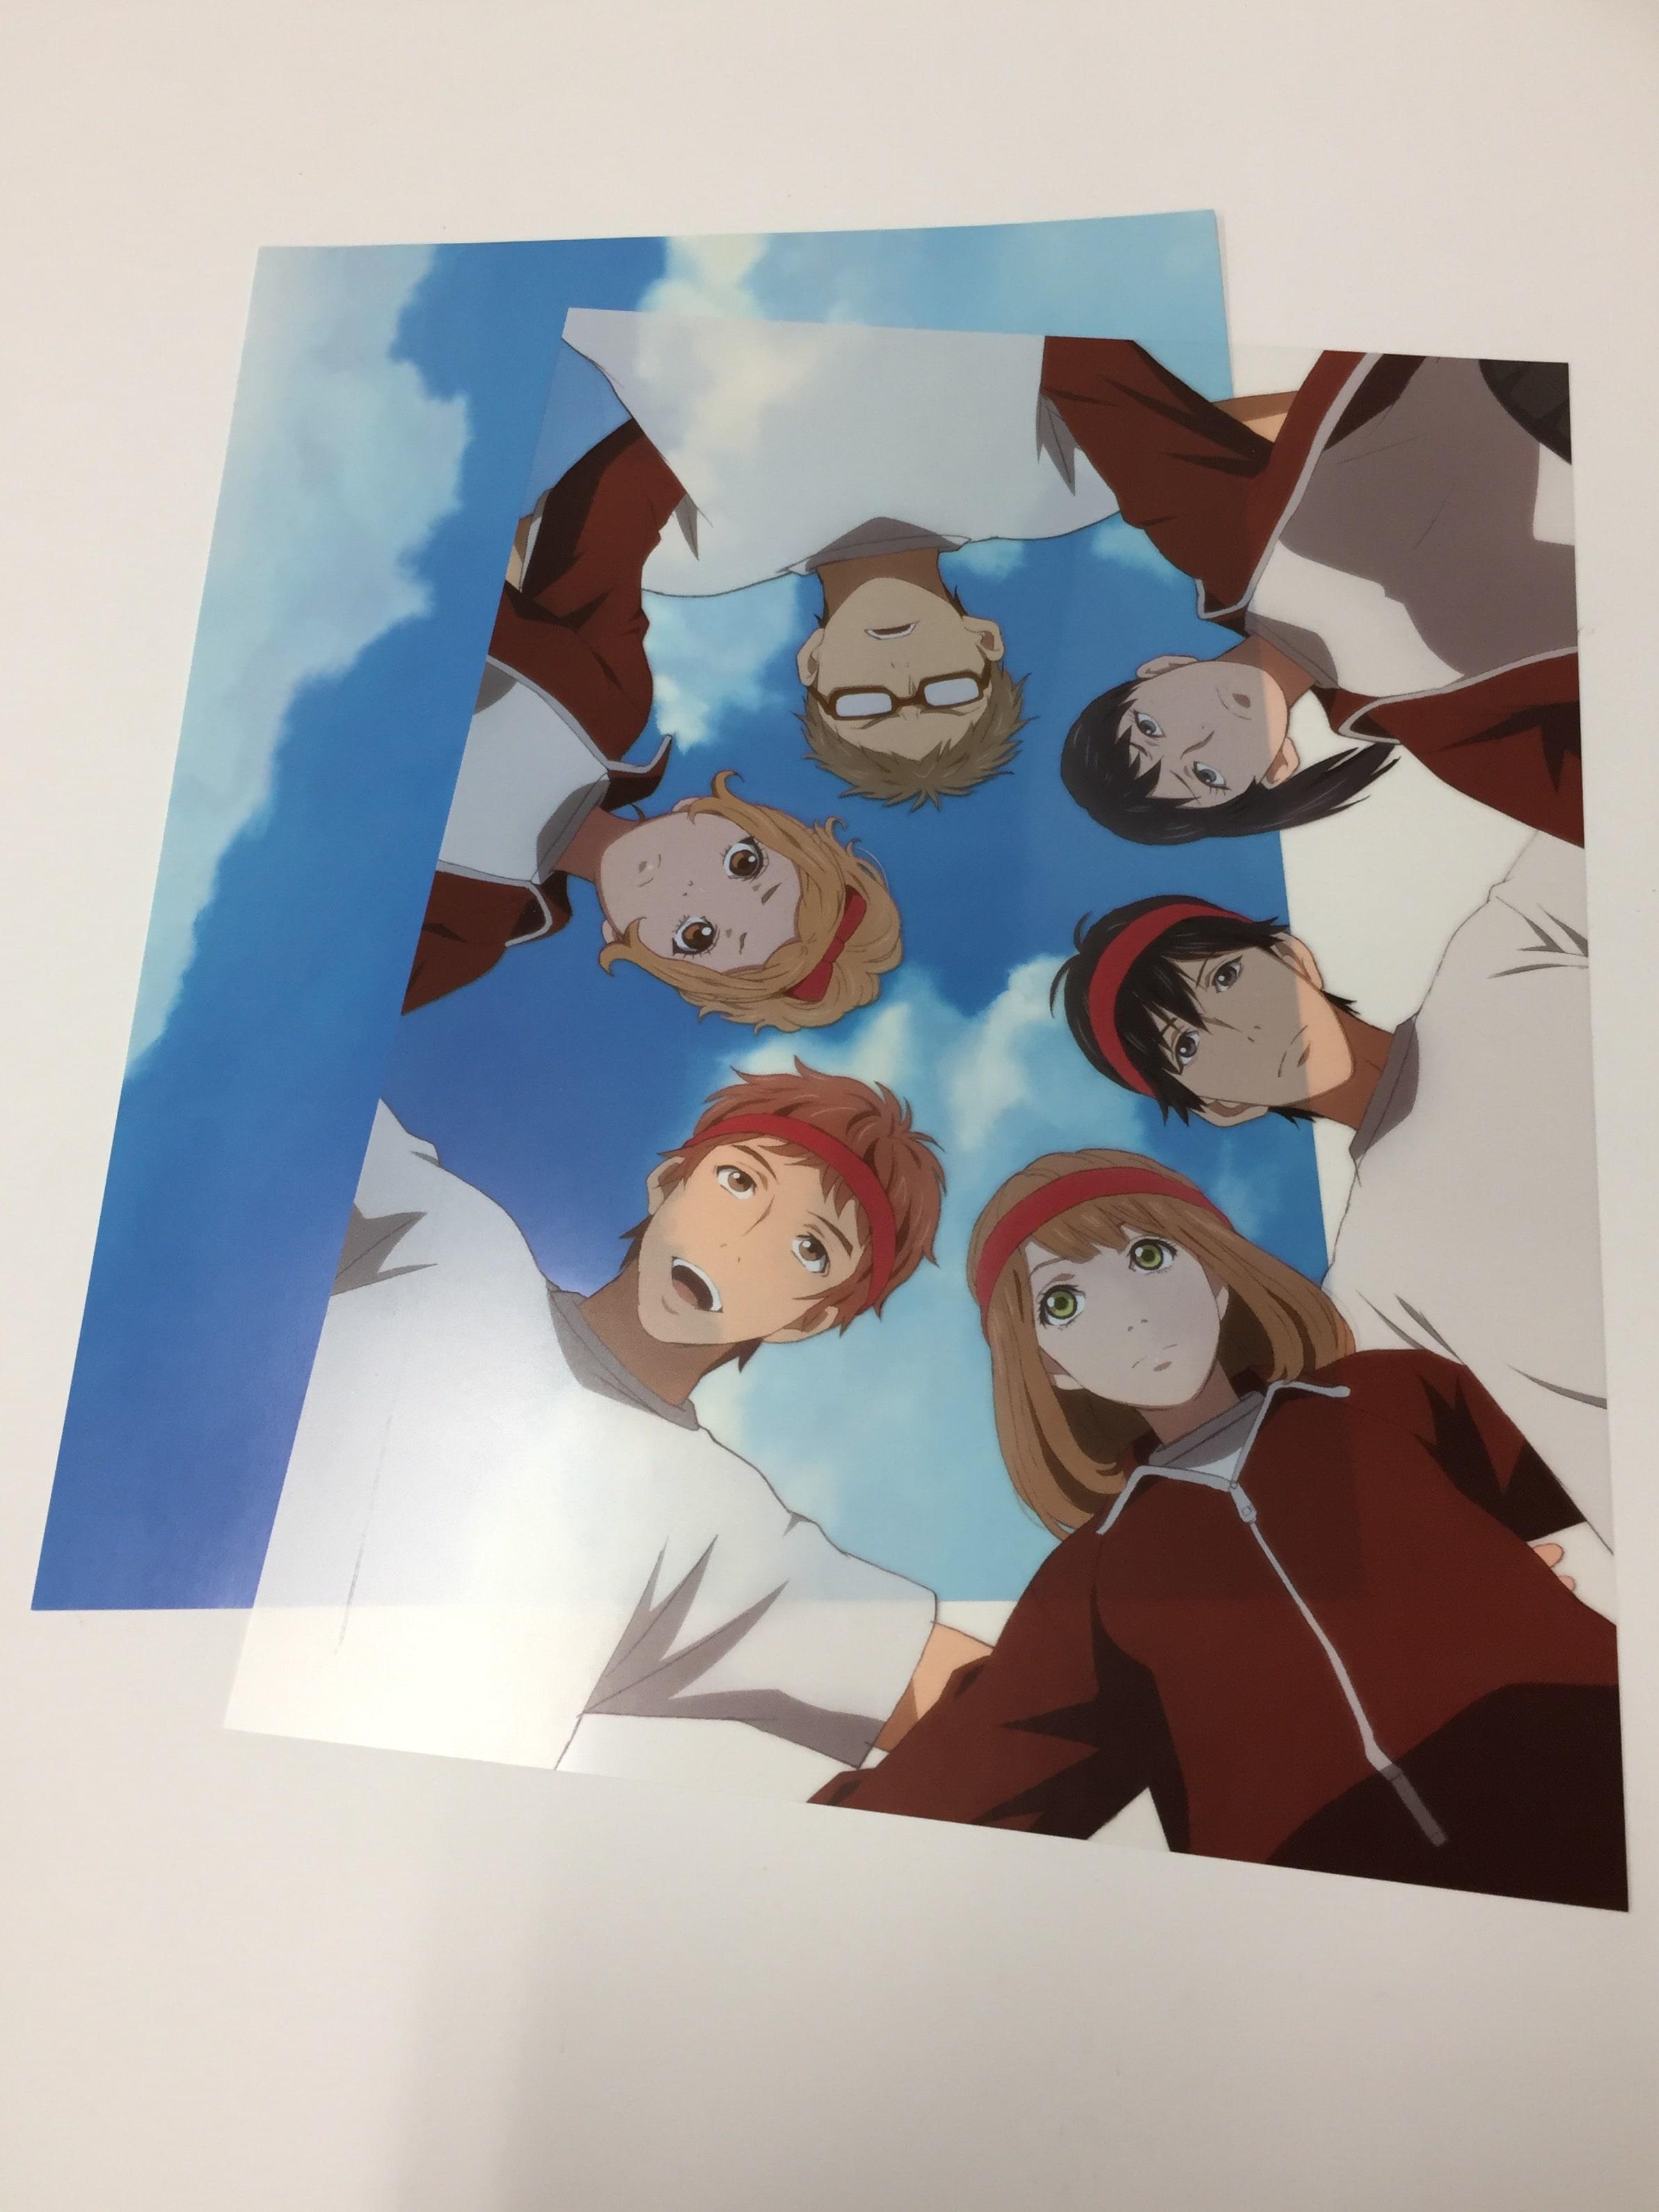 TVアニメ「orange」Vol.5 DVD 初回生産限定版